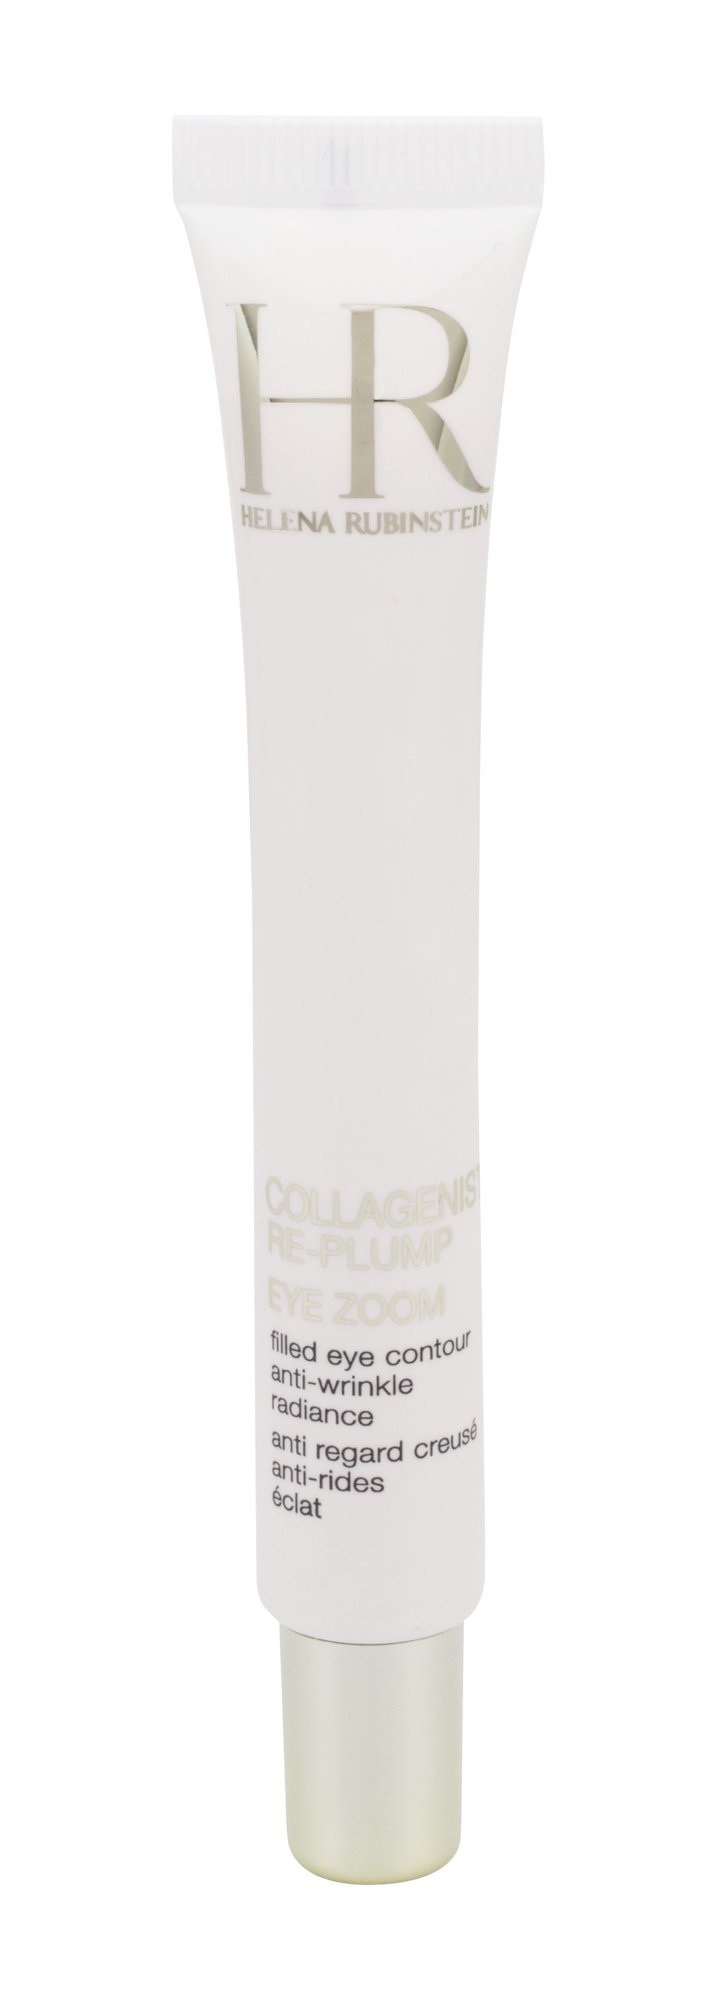 Helena Rubinstein Collagenist Re-Plump Cosmetic 15ml  Eye Zoom